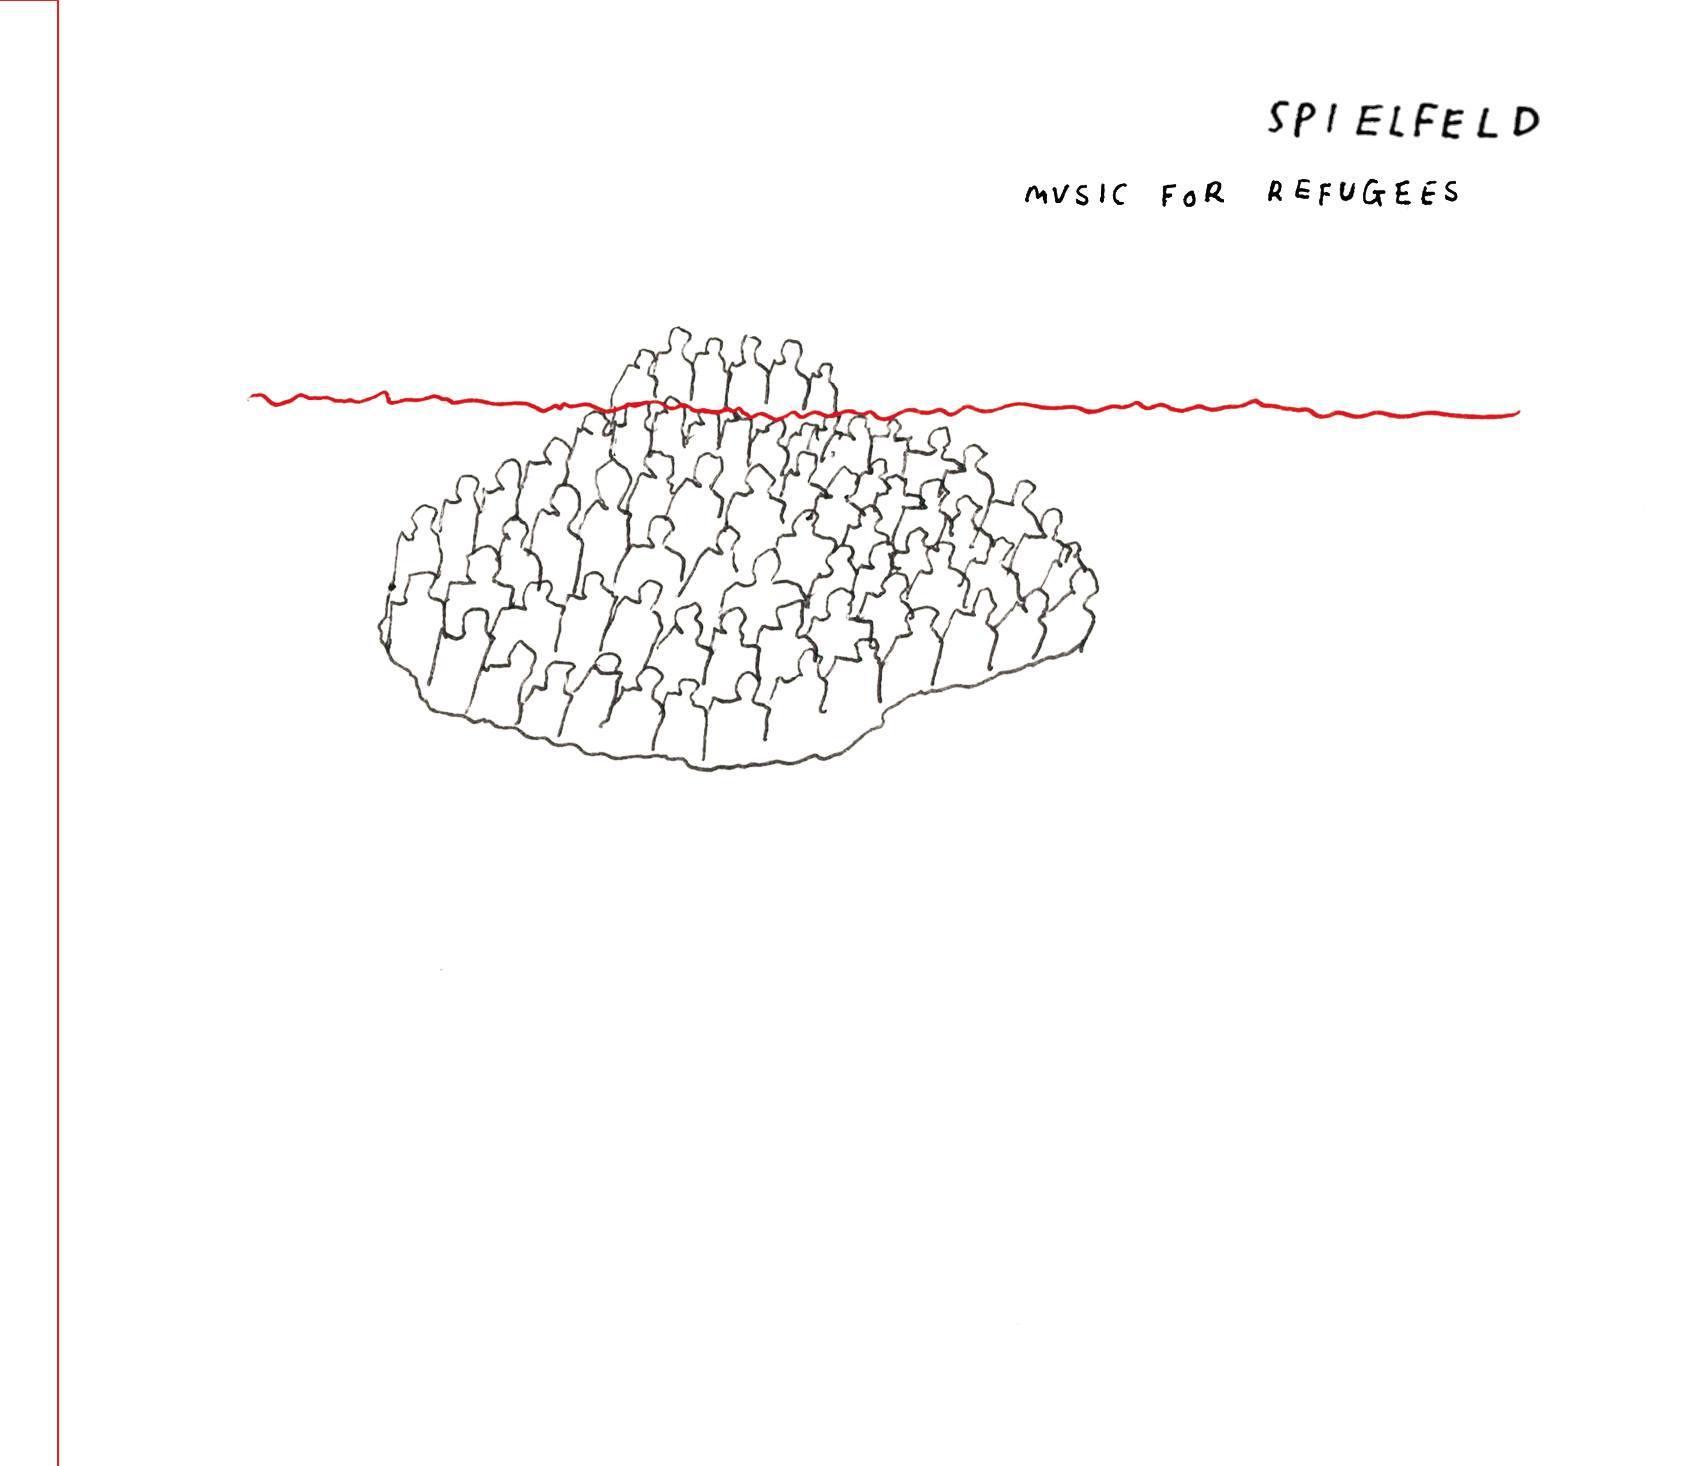 SPIELFELD – Music for Refugees